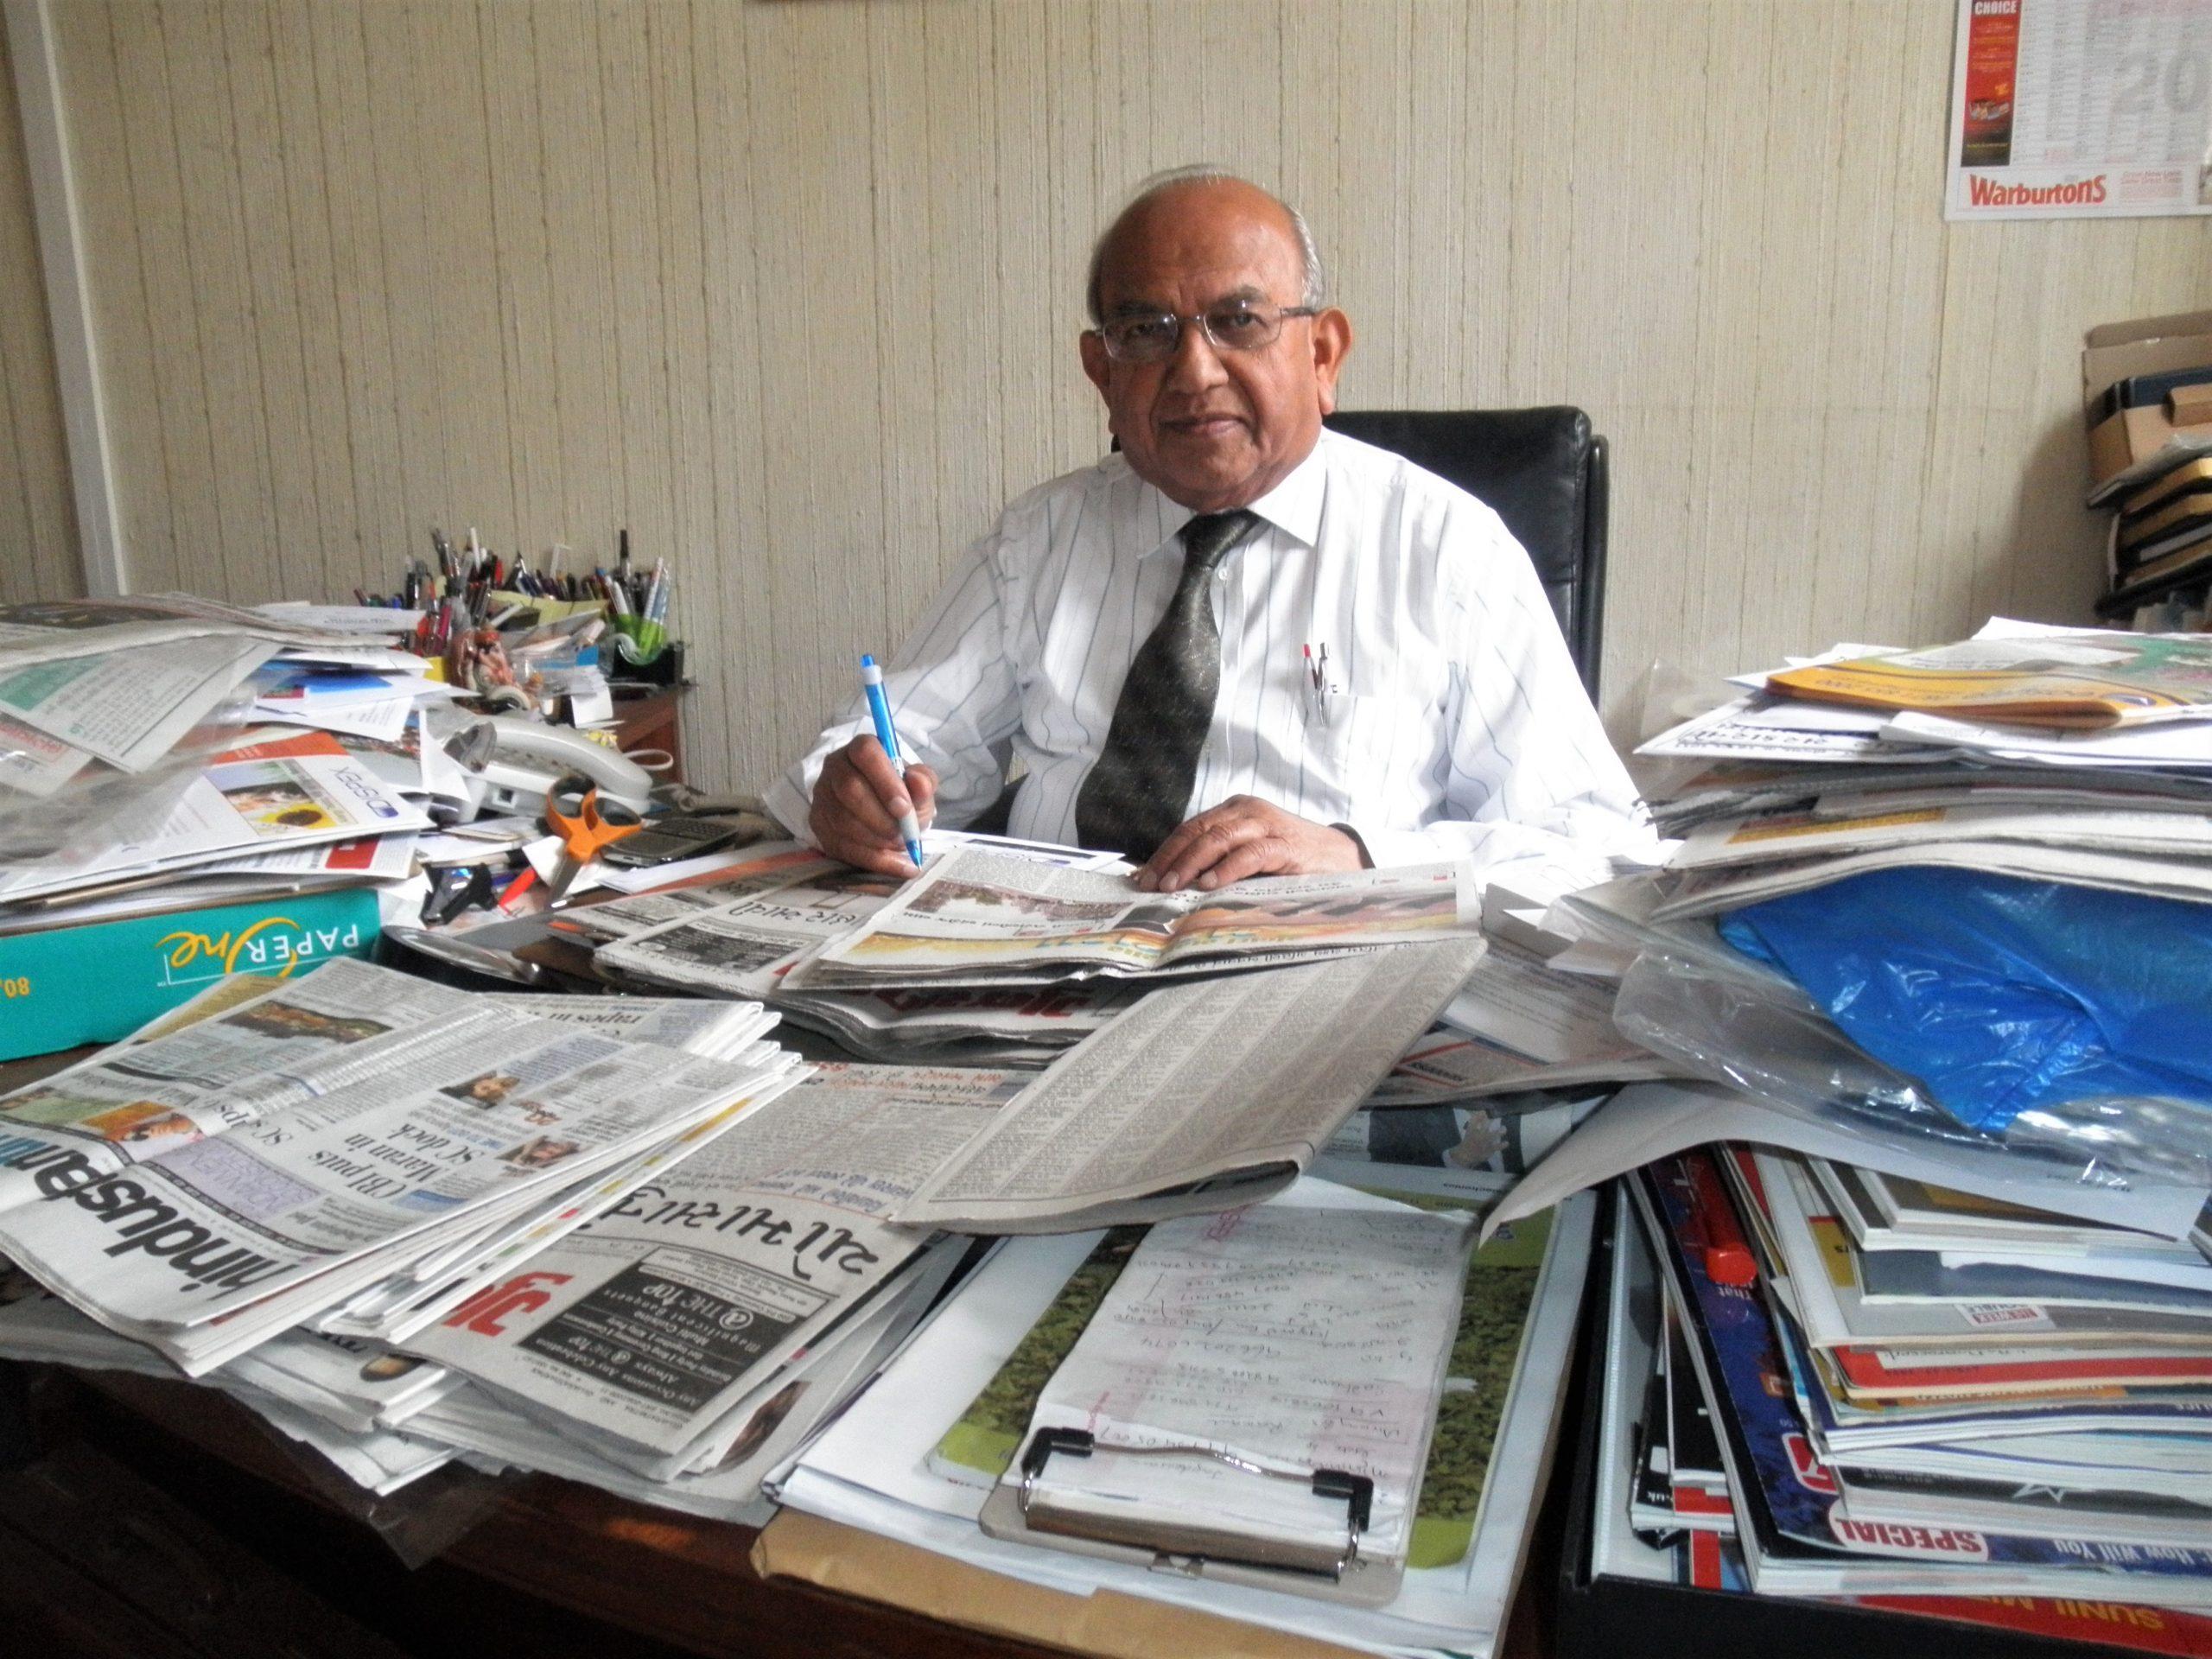 Ramniklal Solanki at his desk at AMG offices.